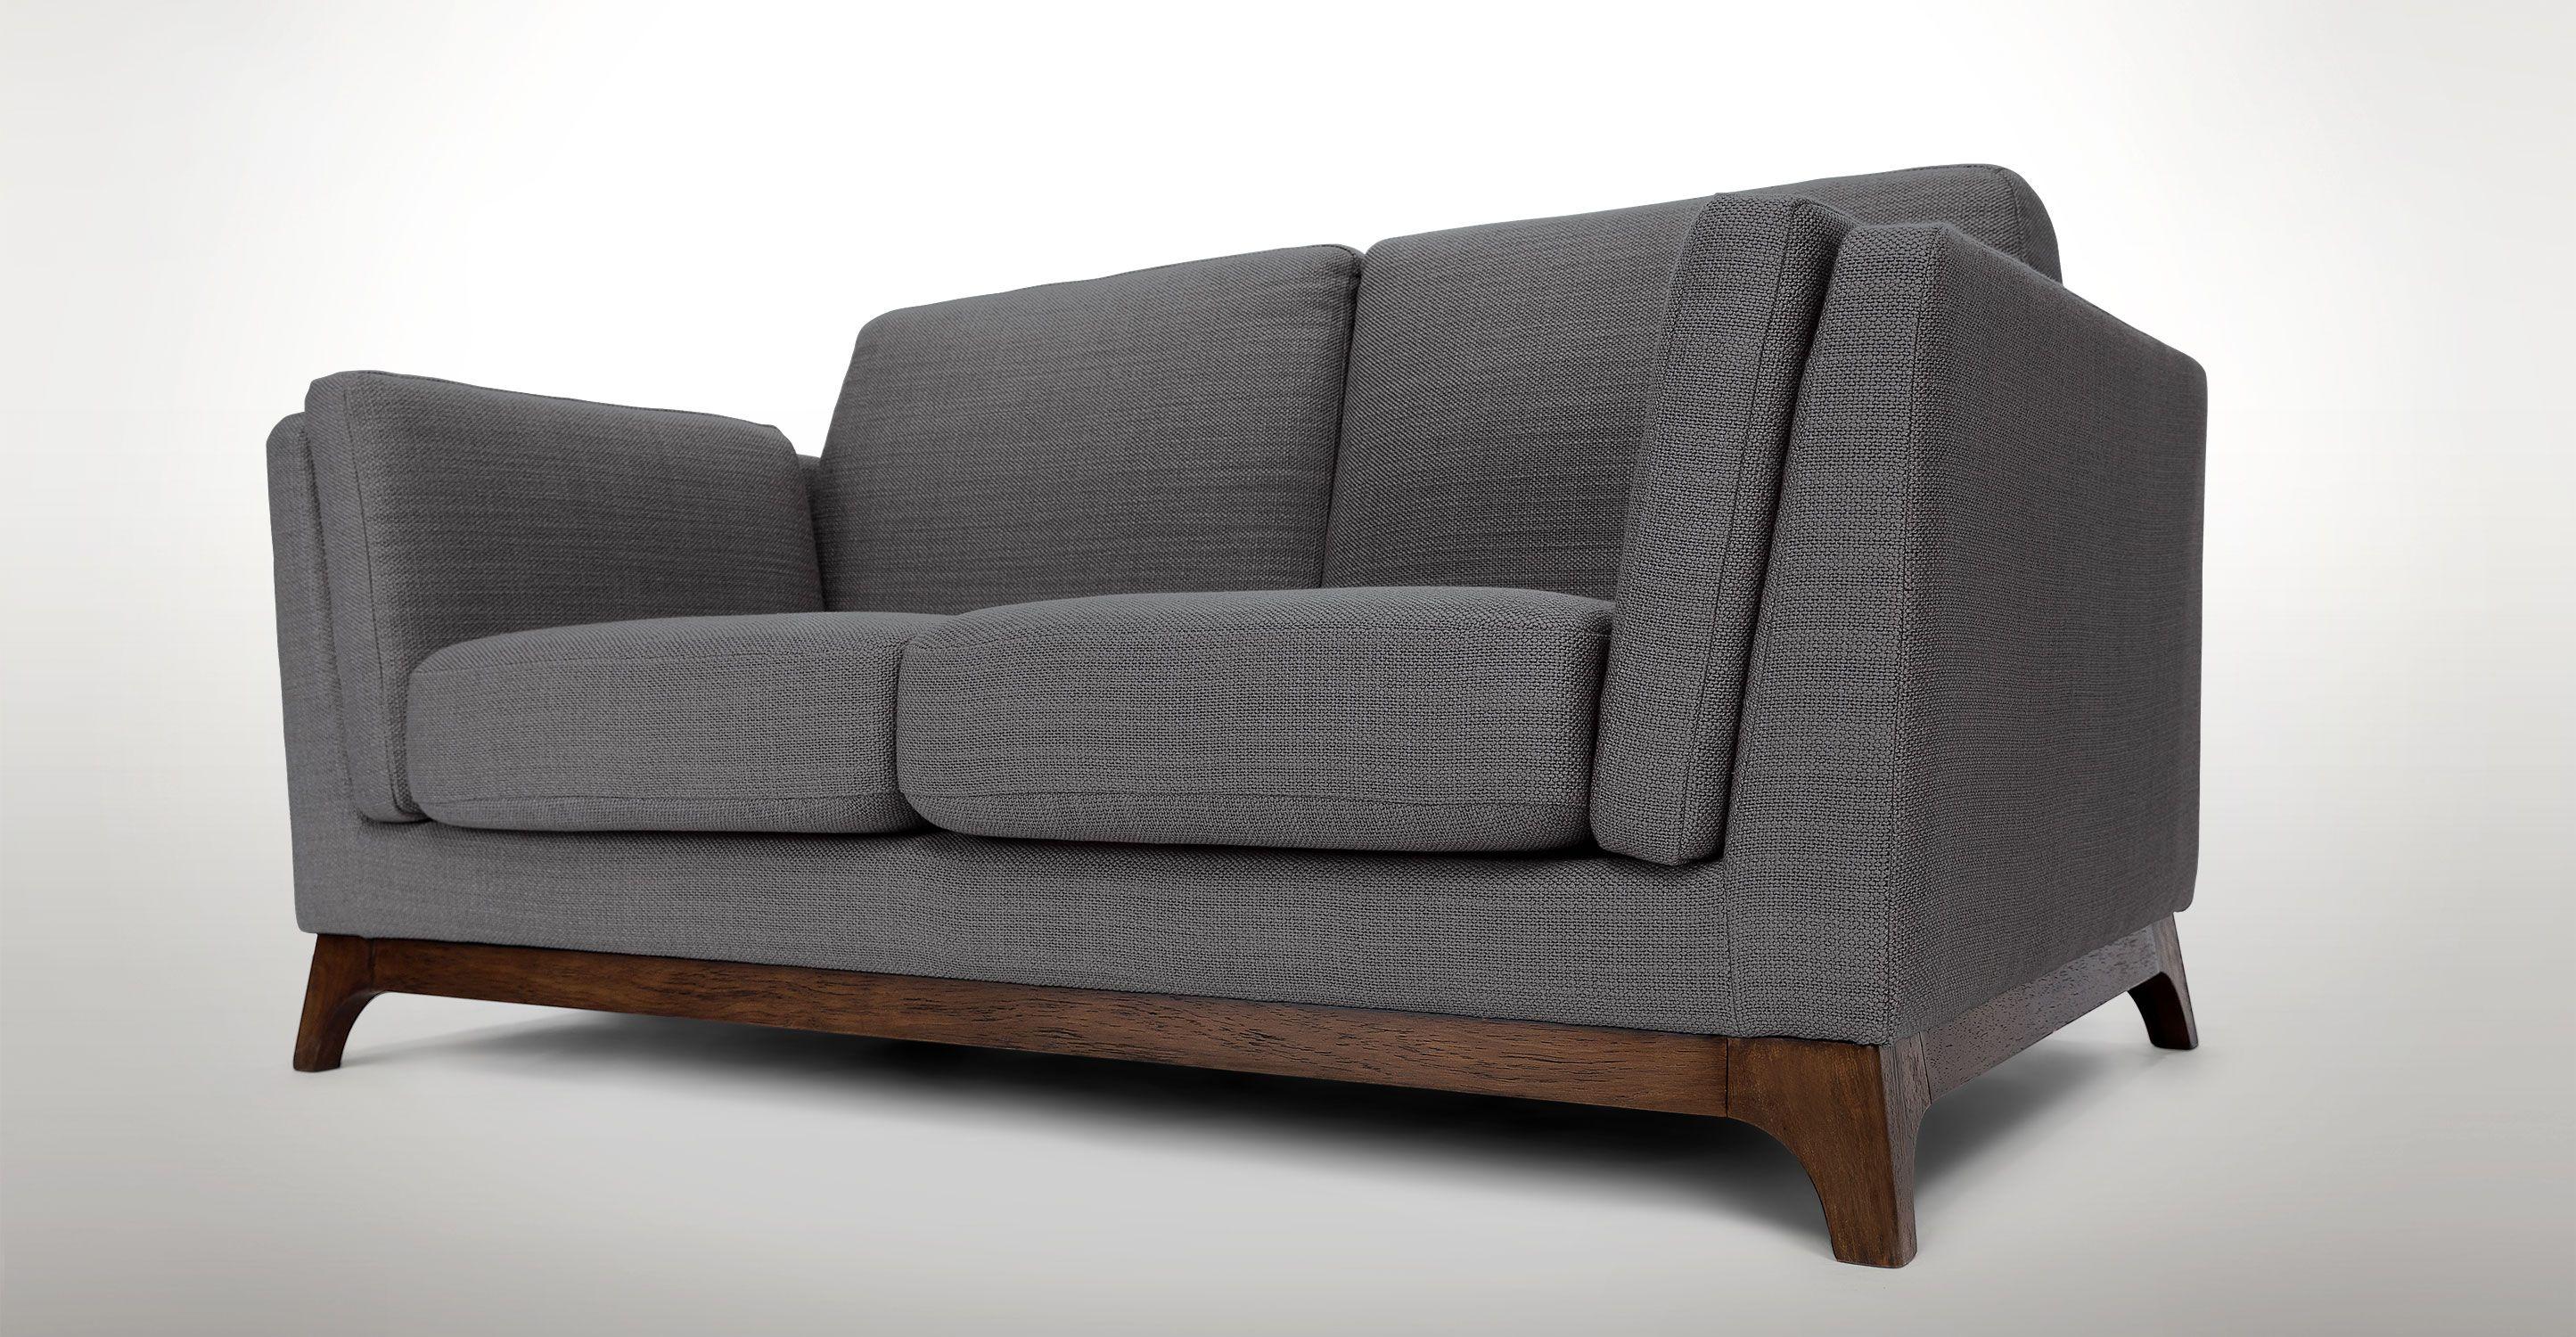 Gray Fabric Loveseat Solid Wood Legs Article Ceni Modern